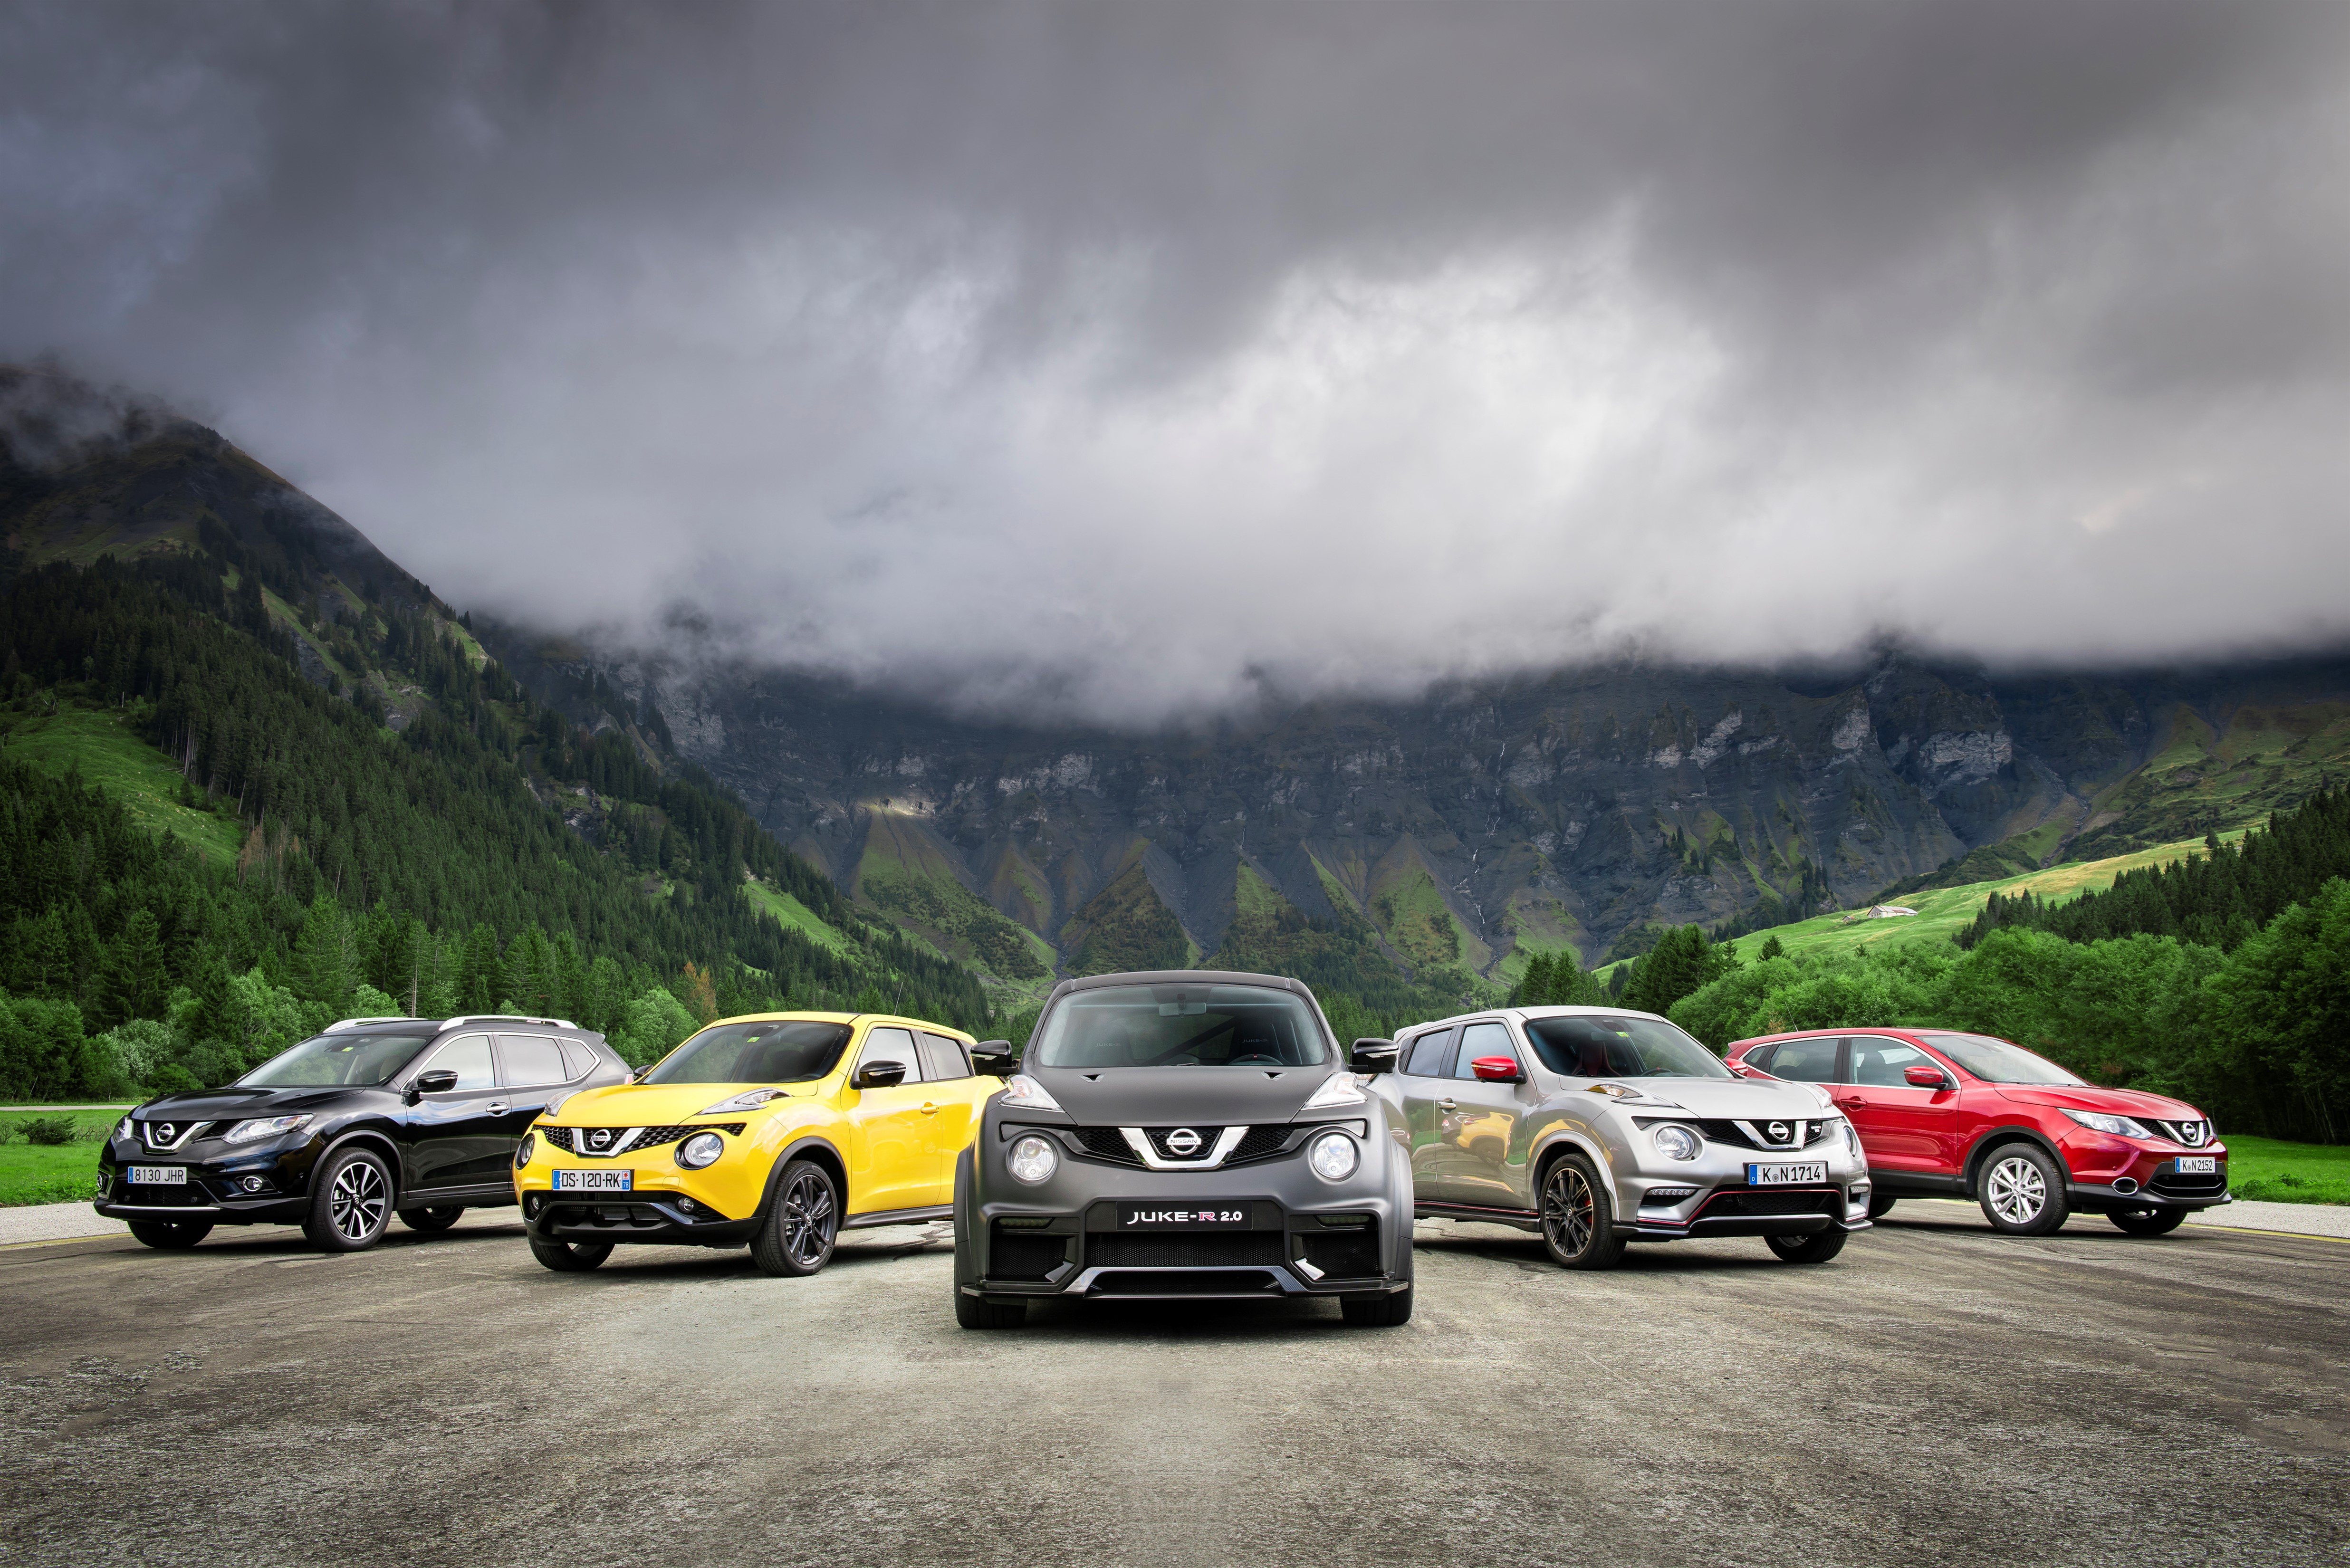 Nissan Juke Promo-Bild